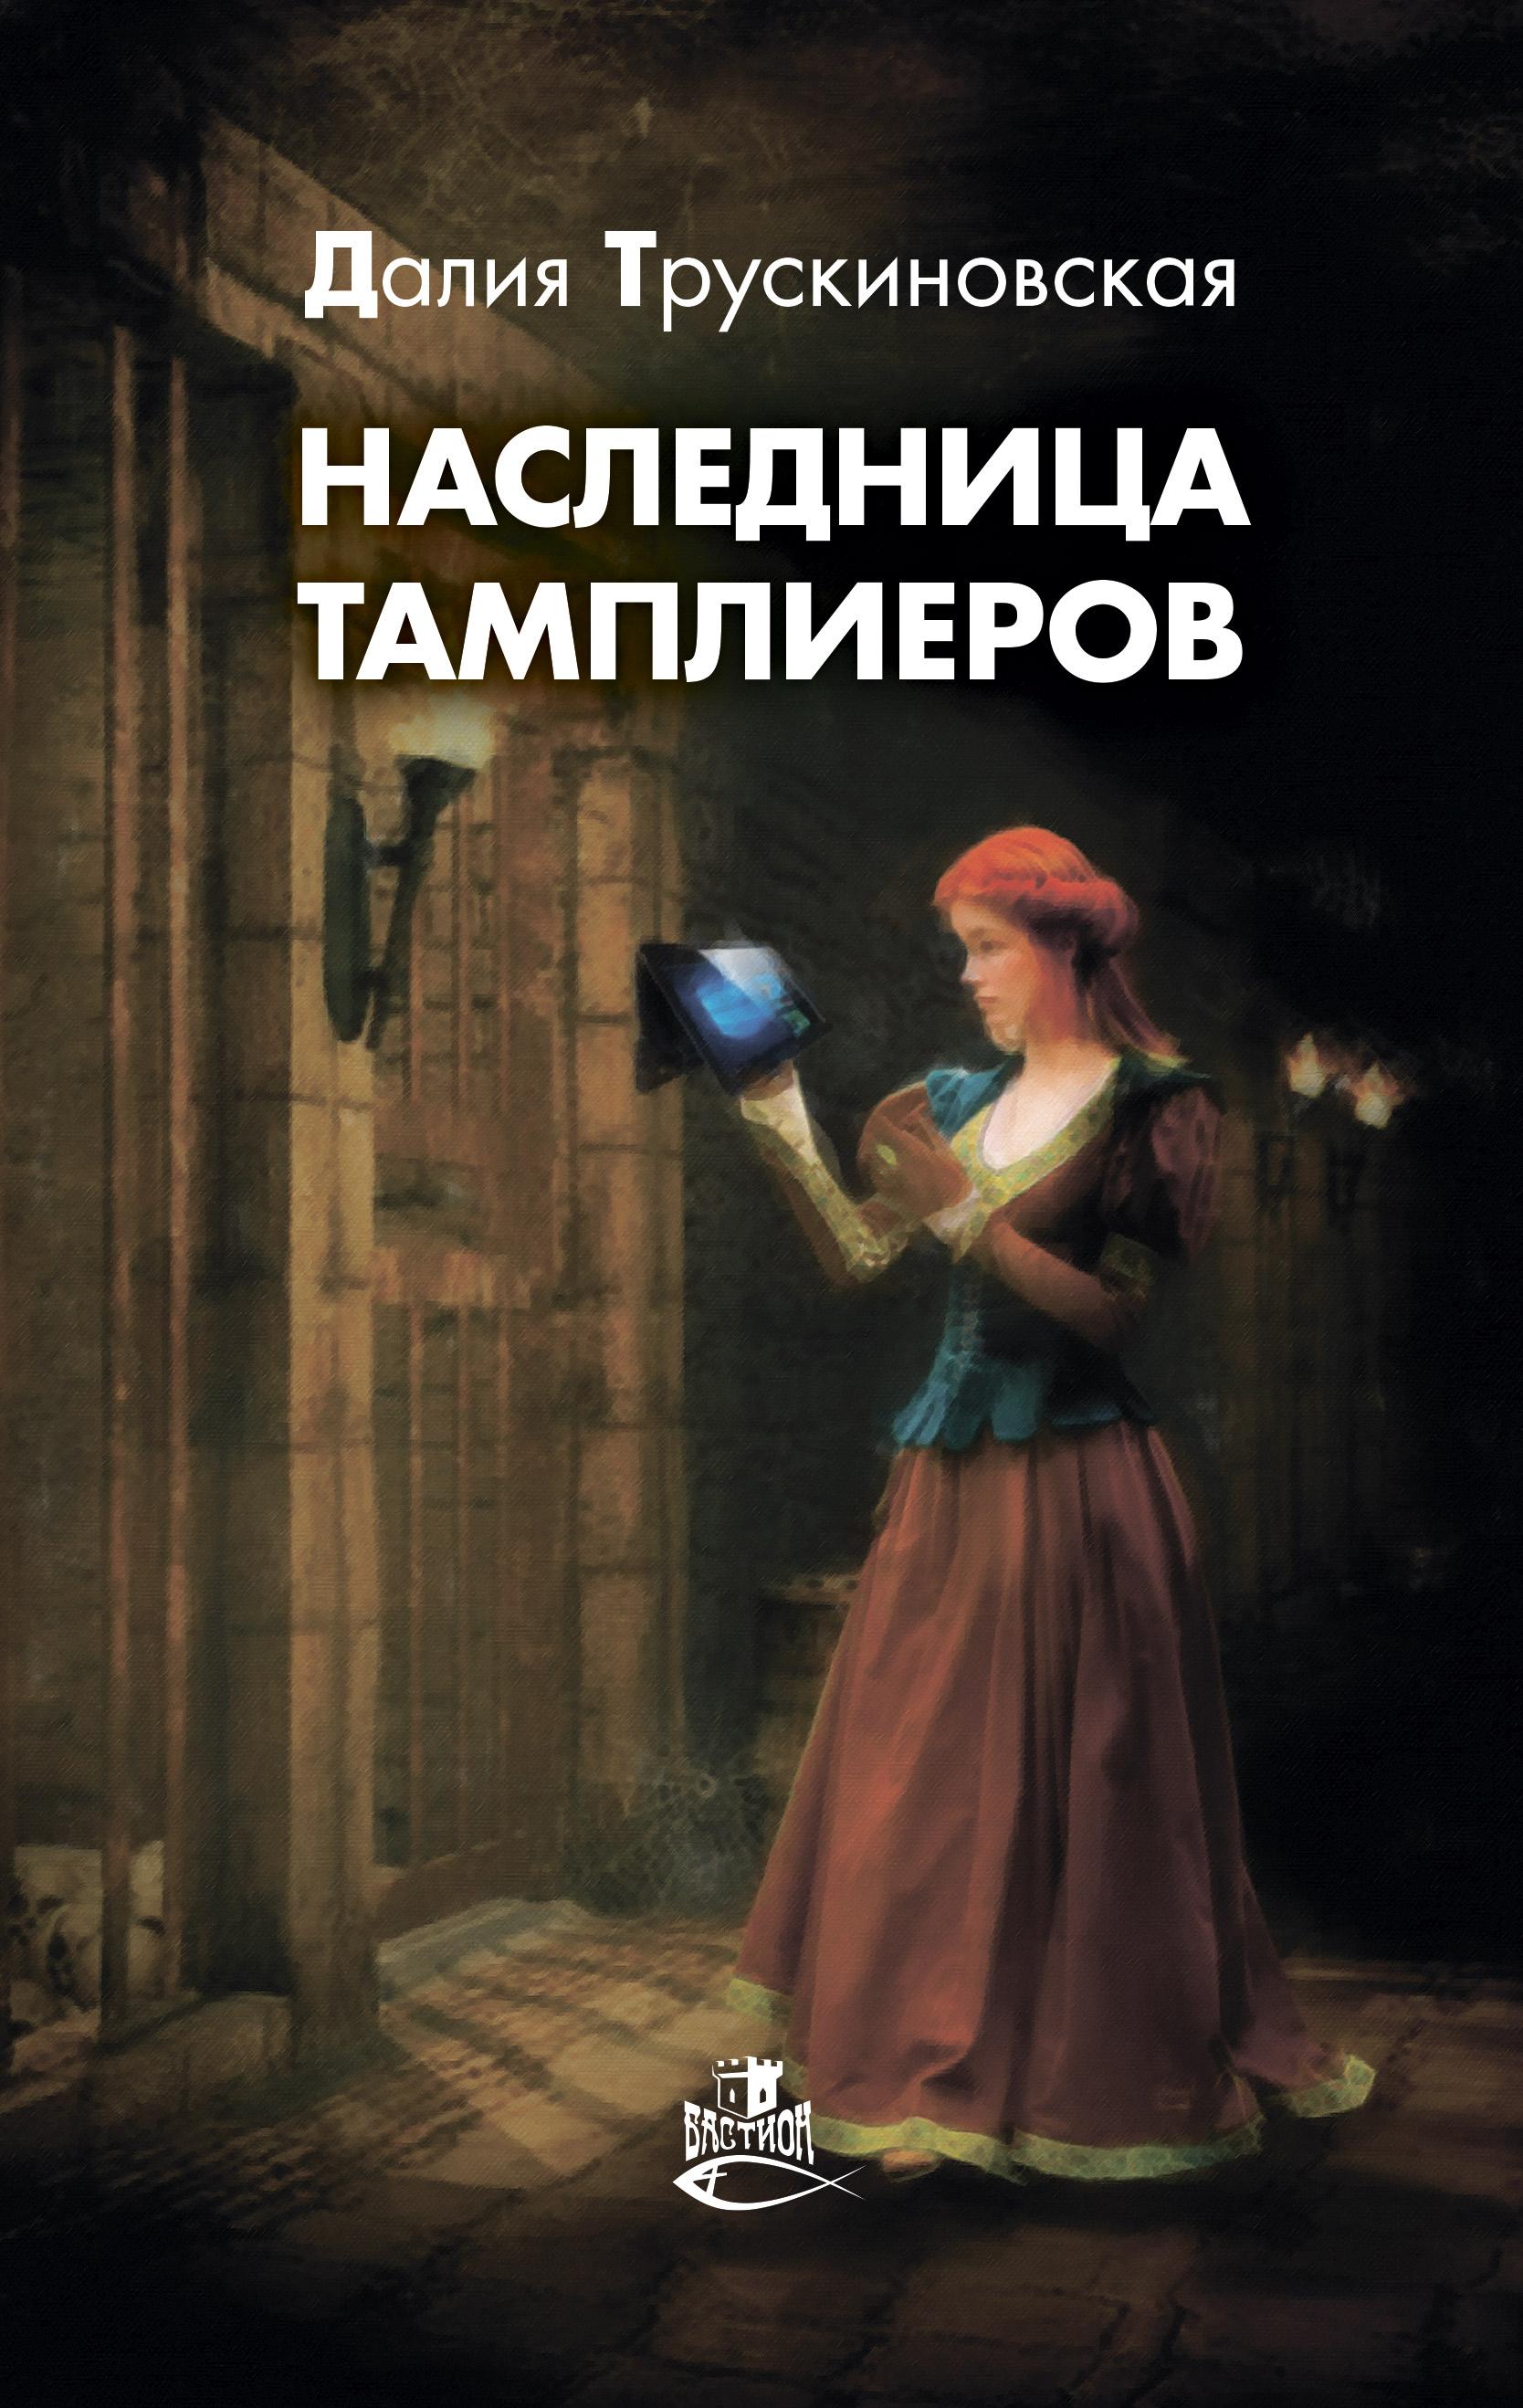 Наследница тамплиеров